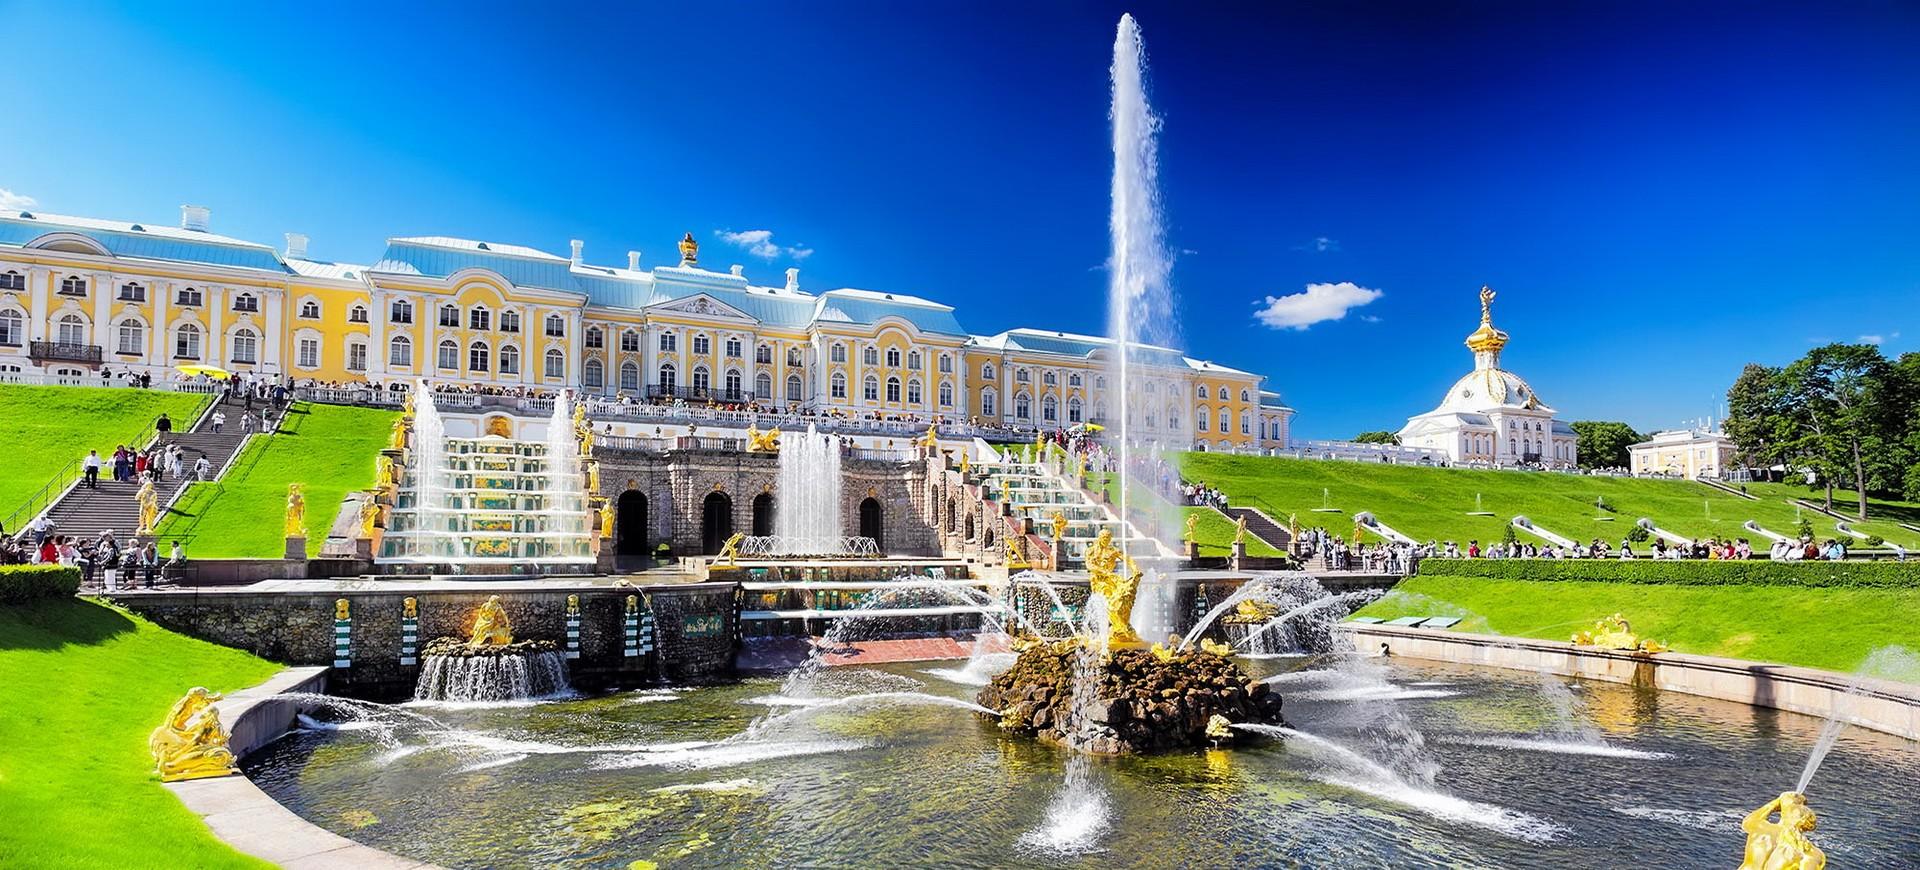 Russie Saint Petersbourg Petrodvorets